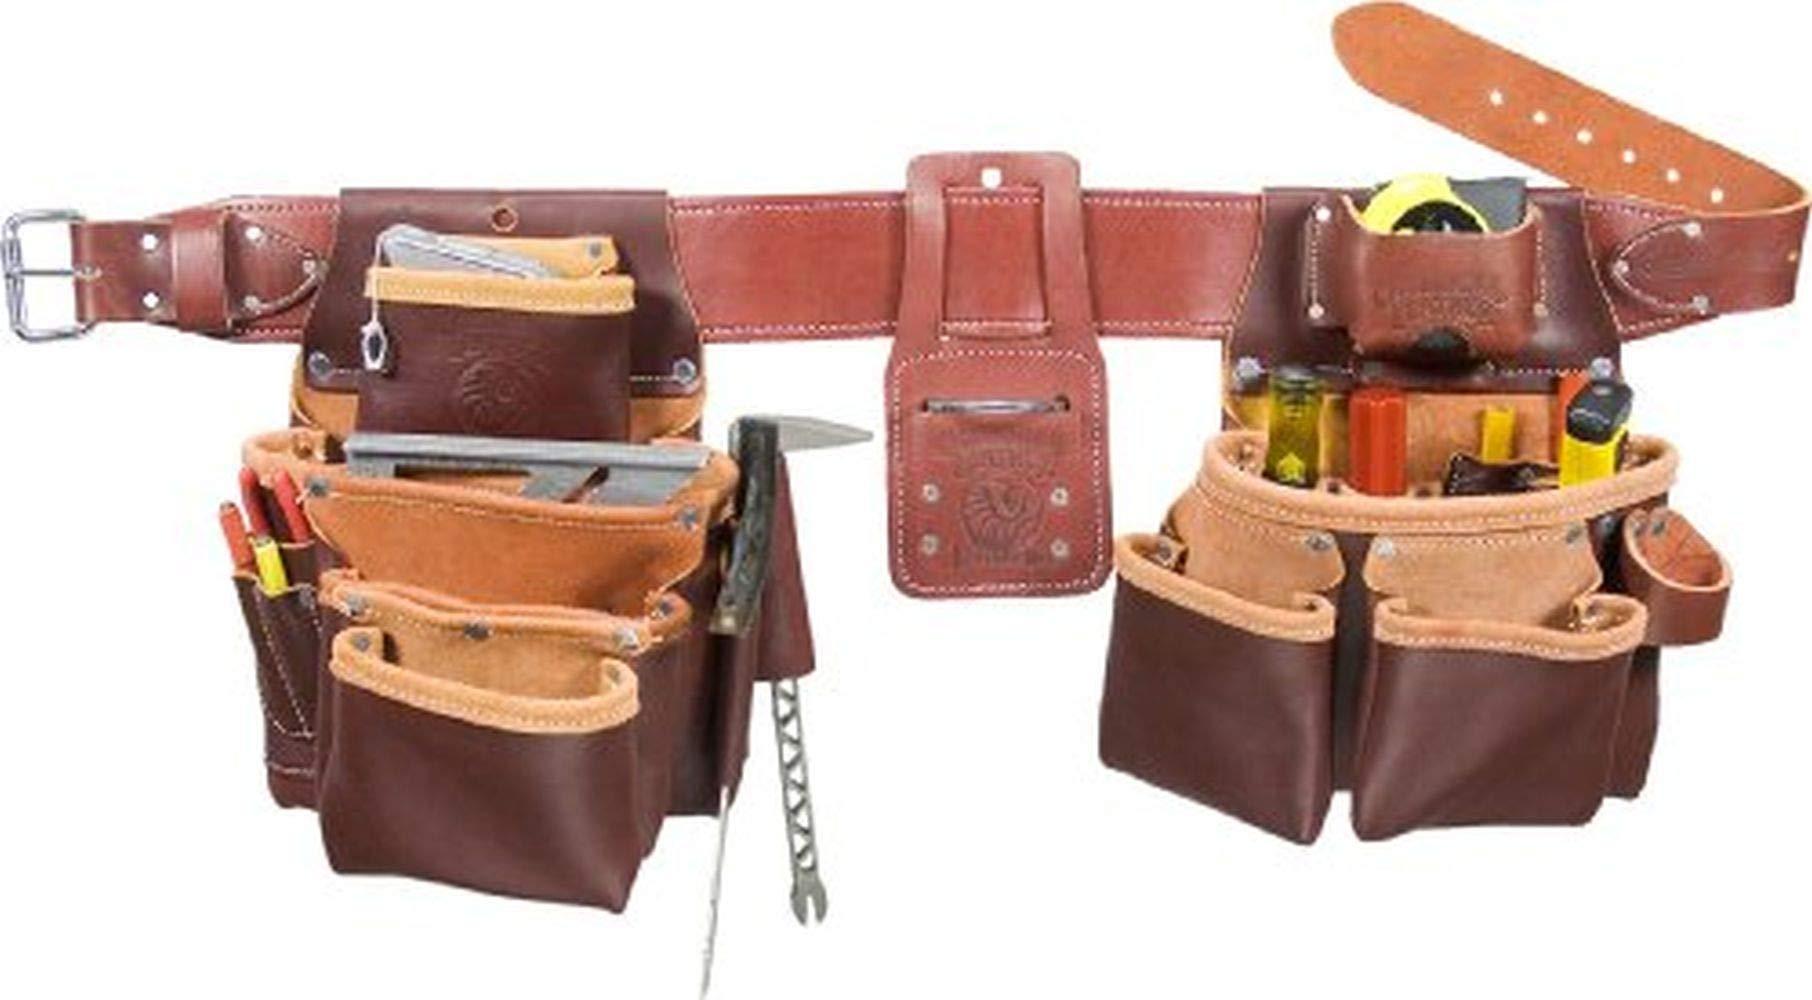 Occidental Leather 5089 M Seven Bag Framer by Occidental Leather